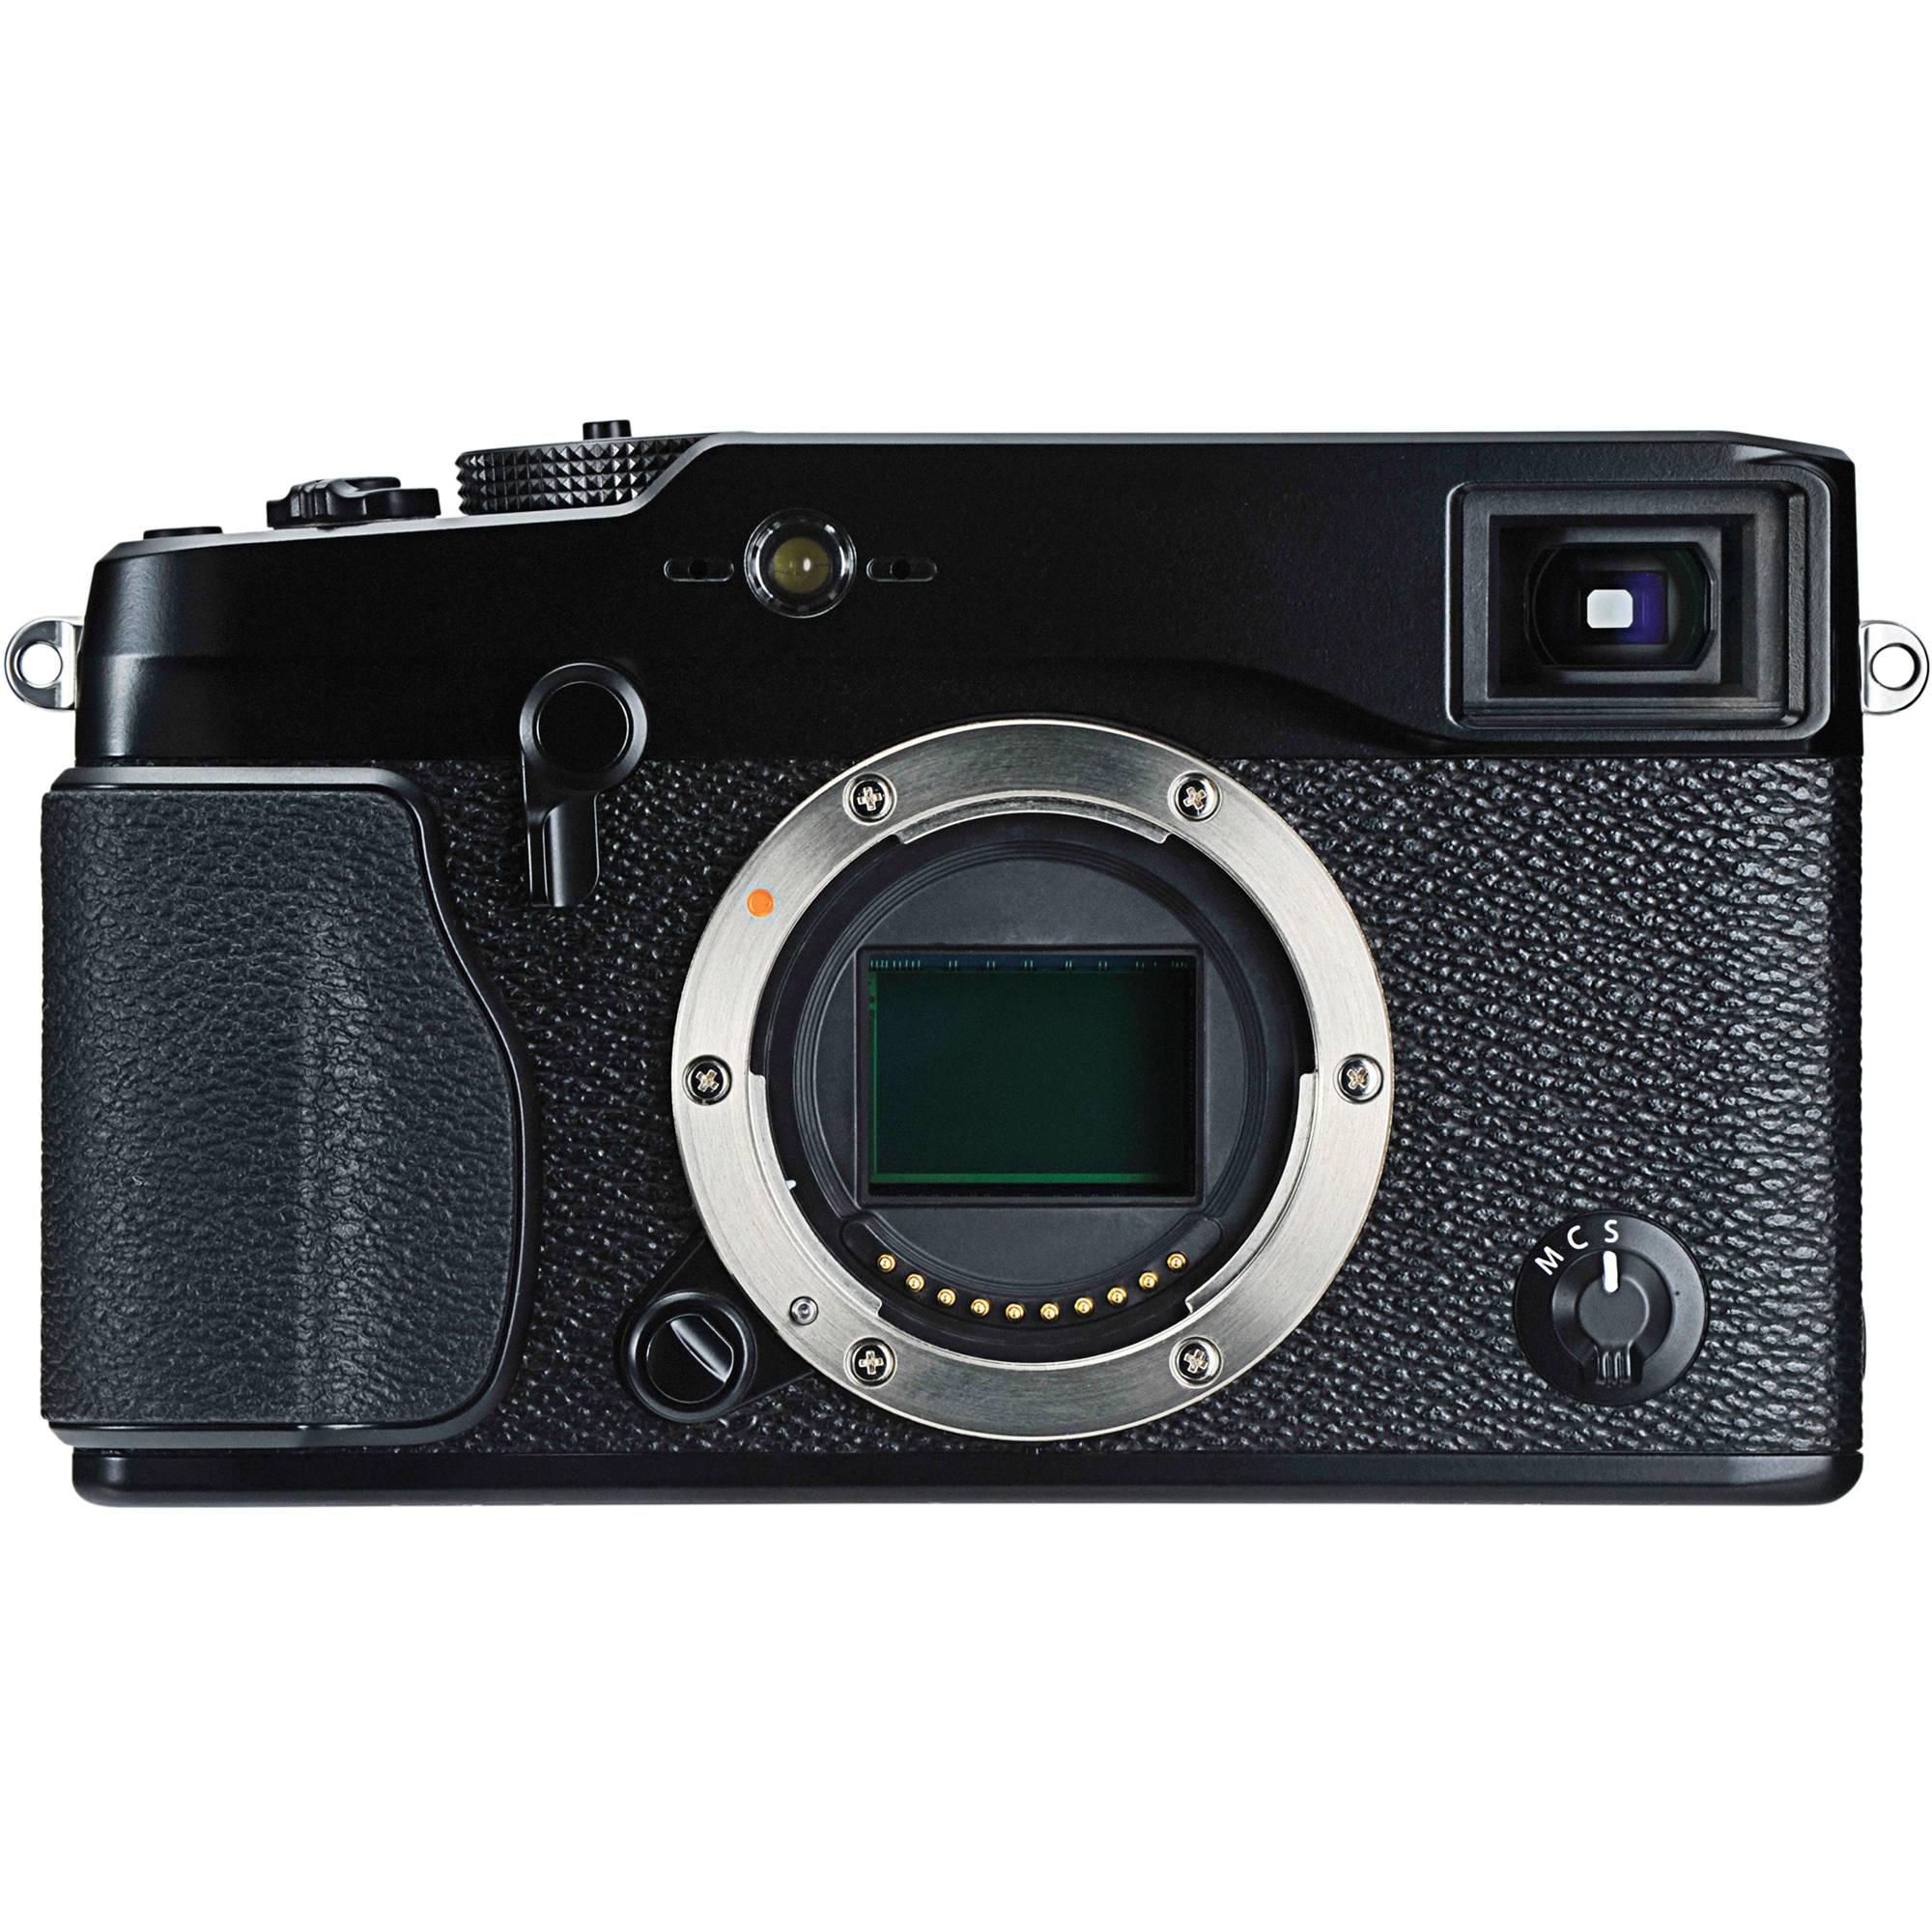 Fuji Digital Cameras: Fujifilm X-Pro1 Mirrorless Digital Camera (Body Only) 16225391